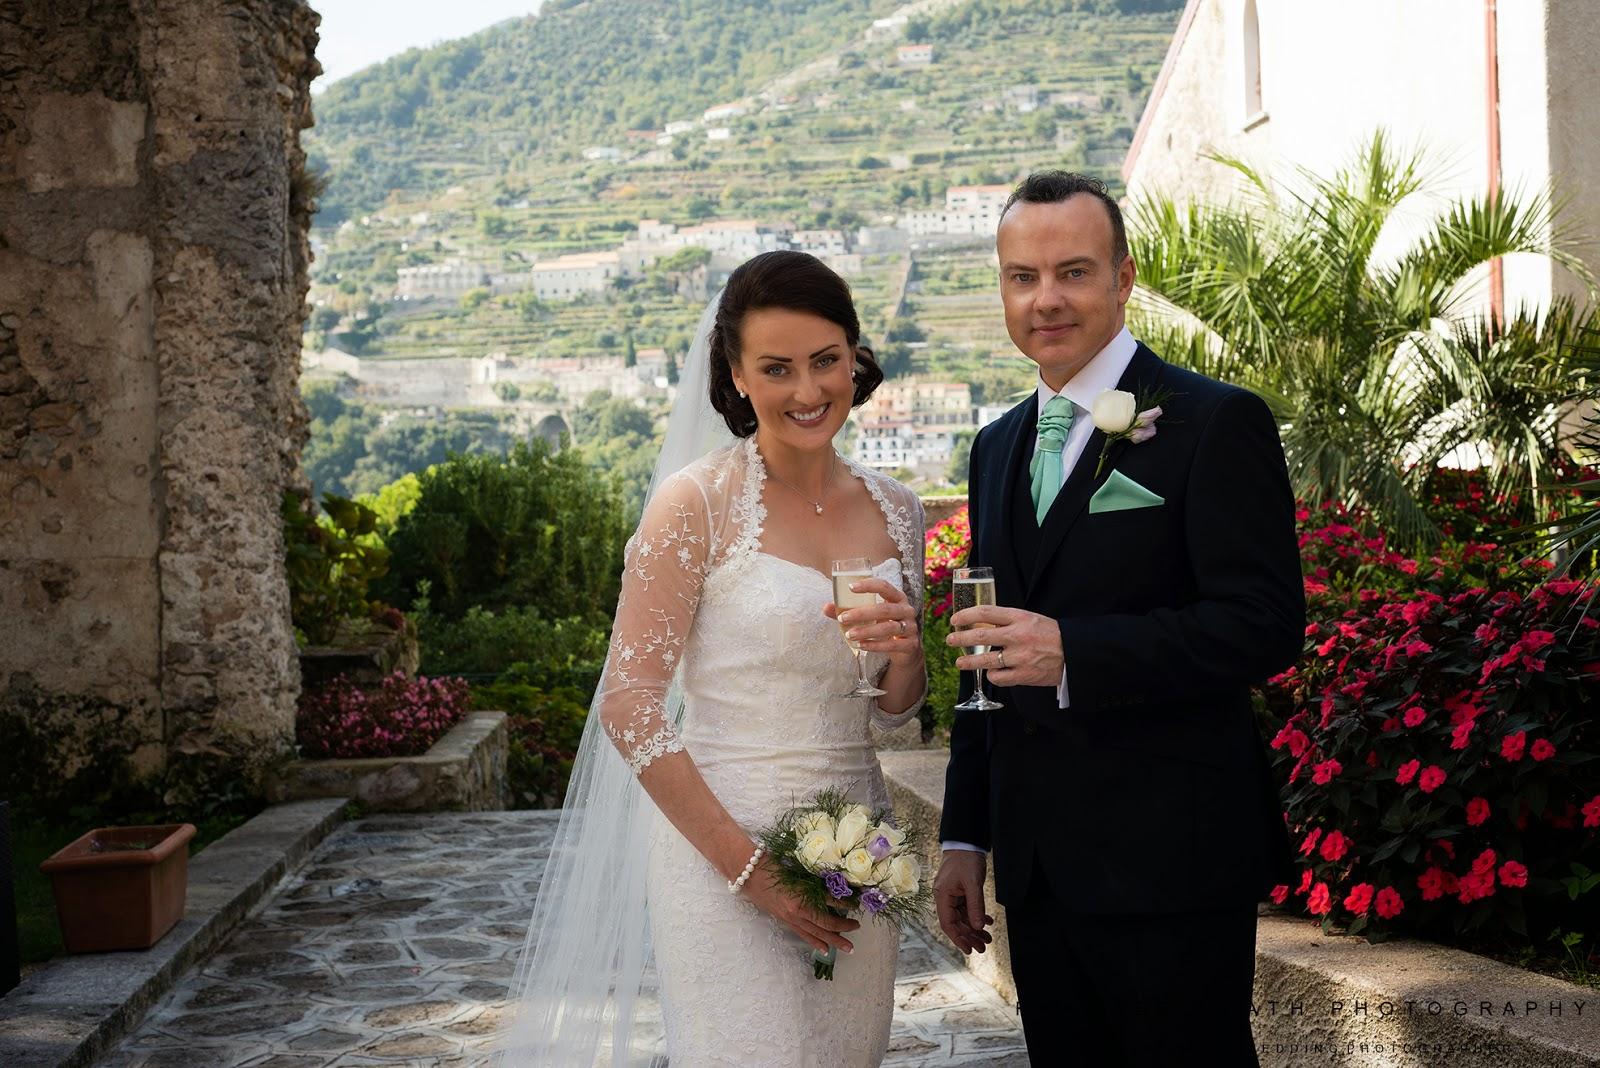 Wedding in Ravello Italy